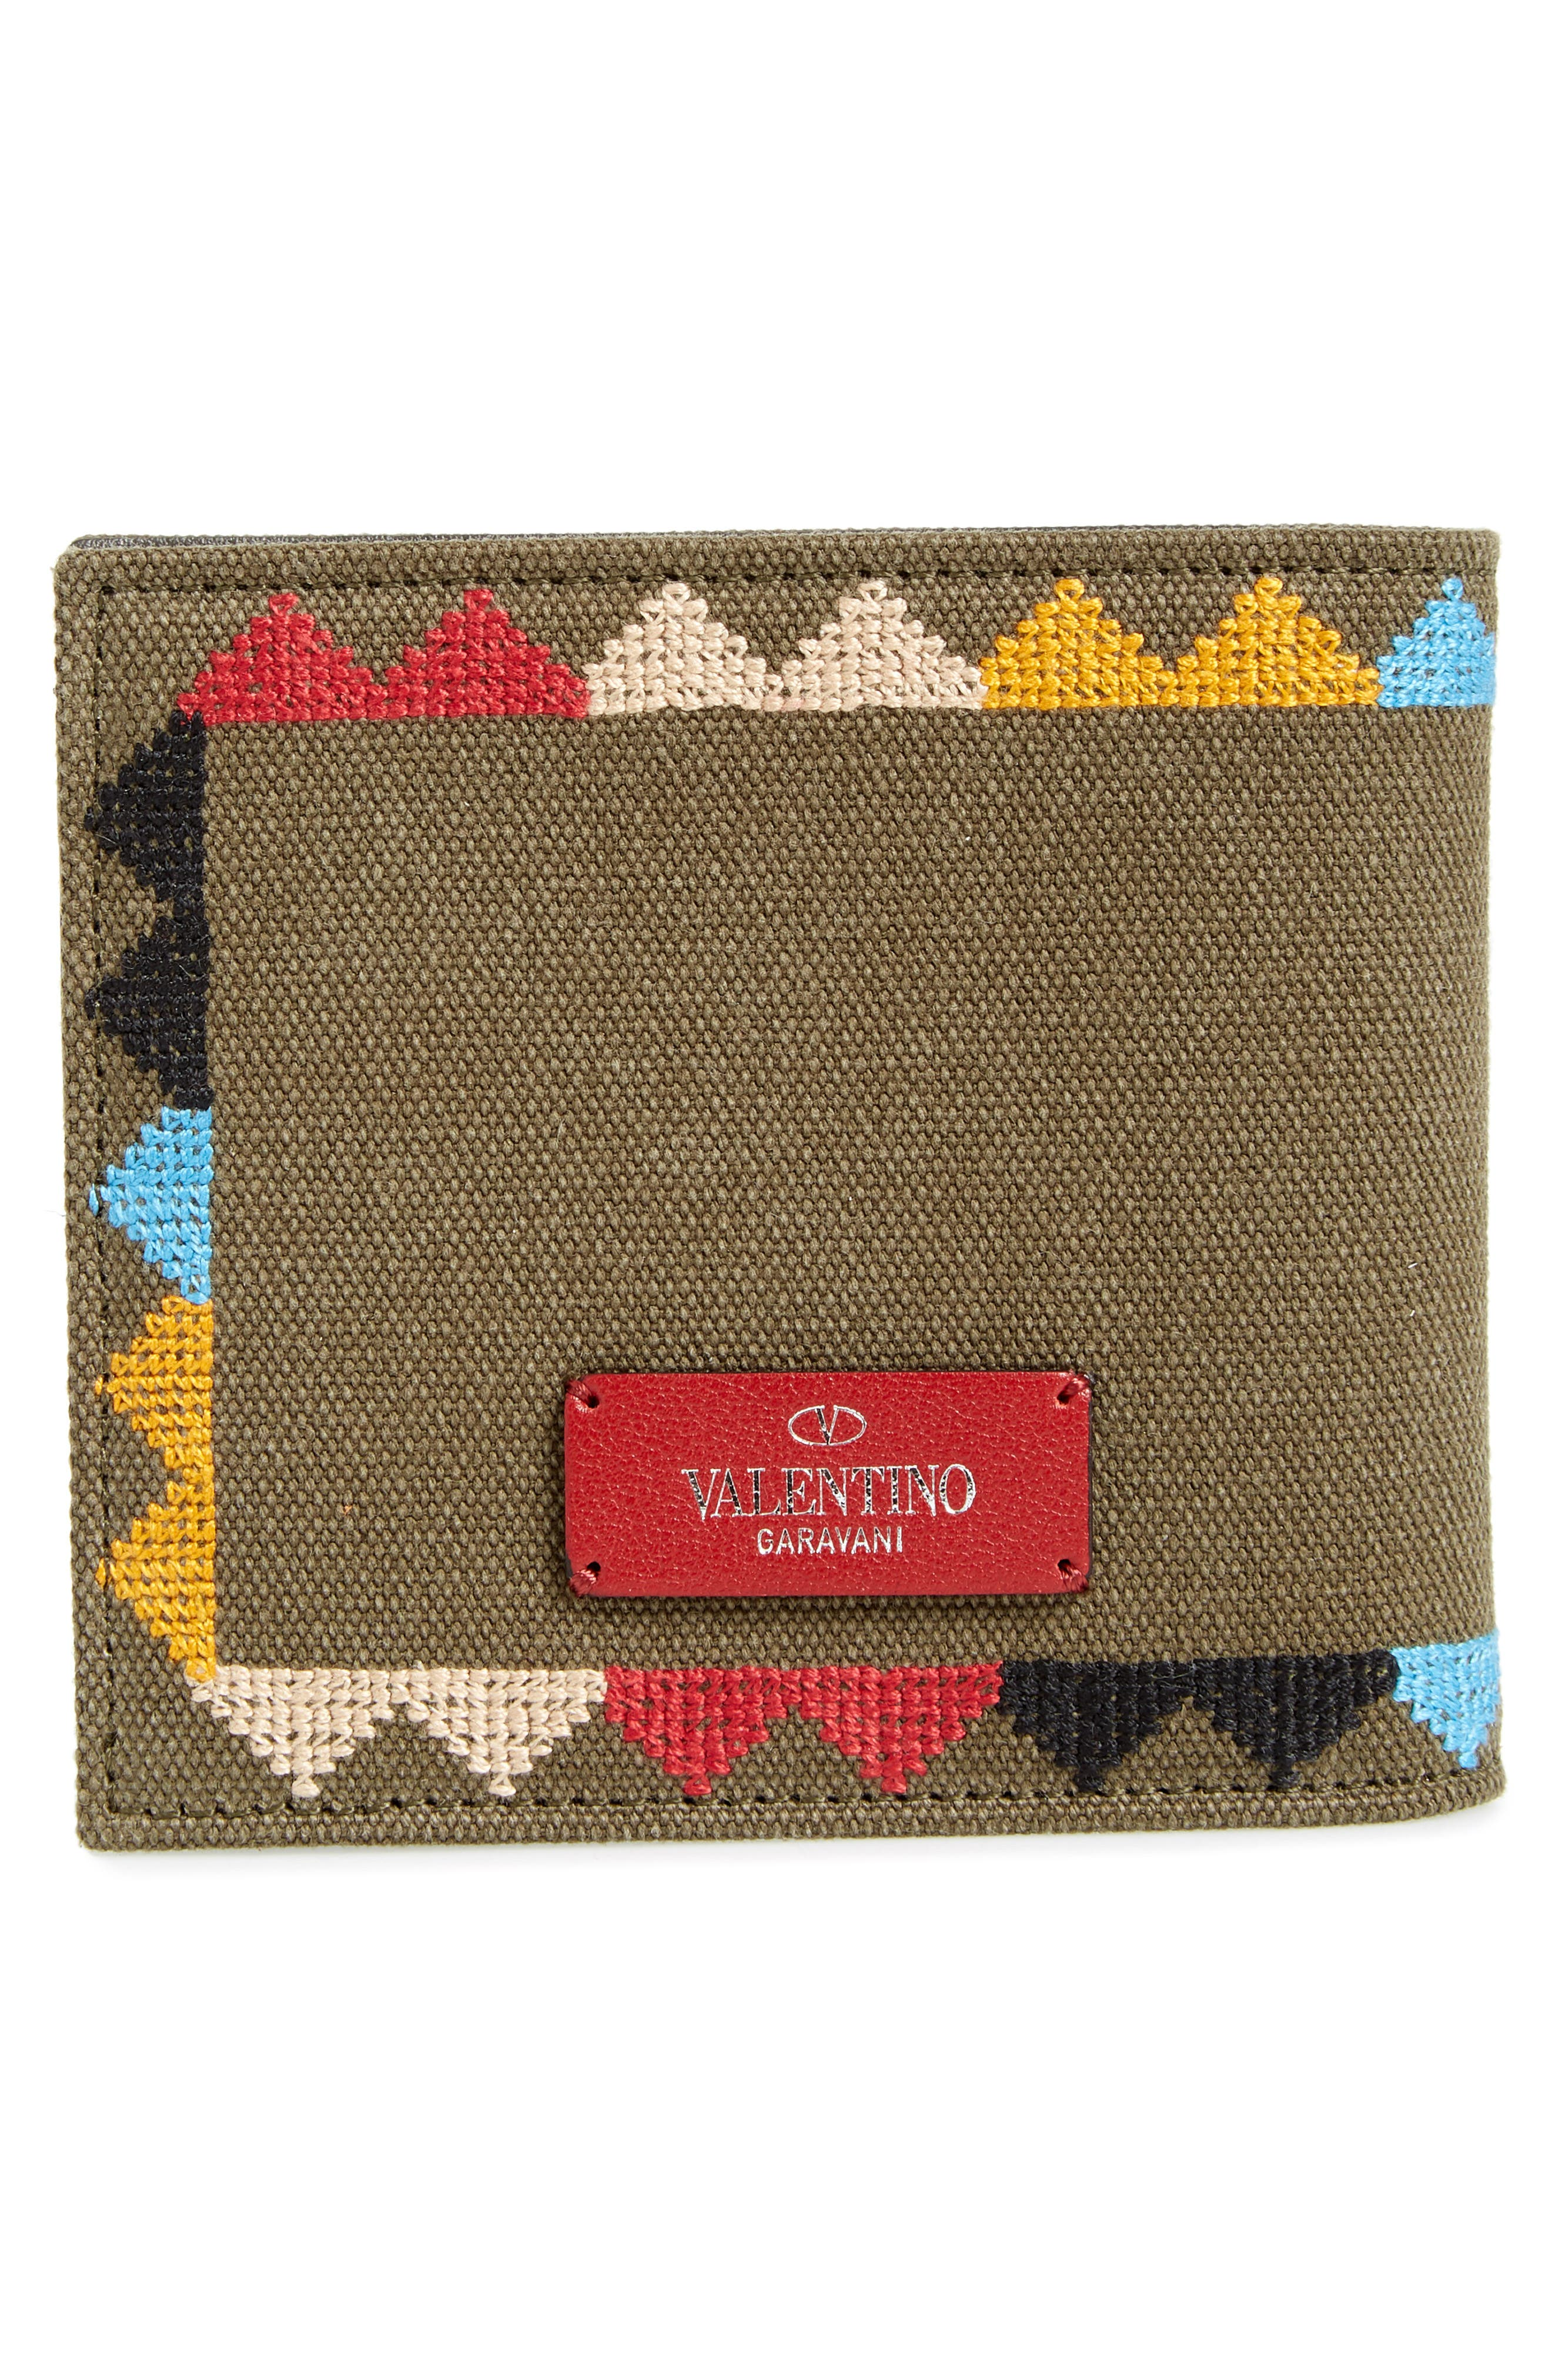 GARAVANI Canvas Wallet,                             Alternate thumbnail 3, color,                             370